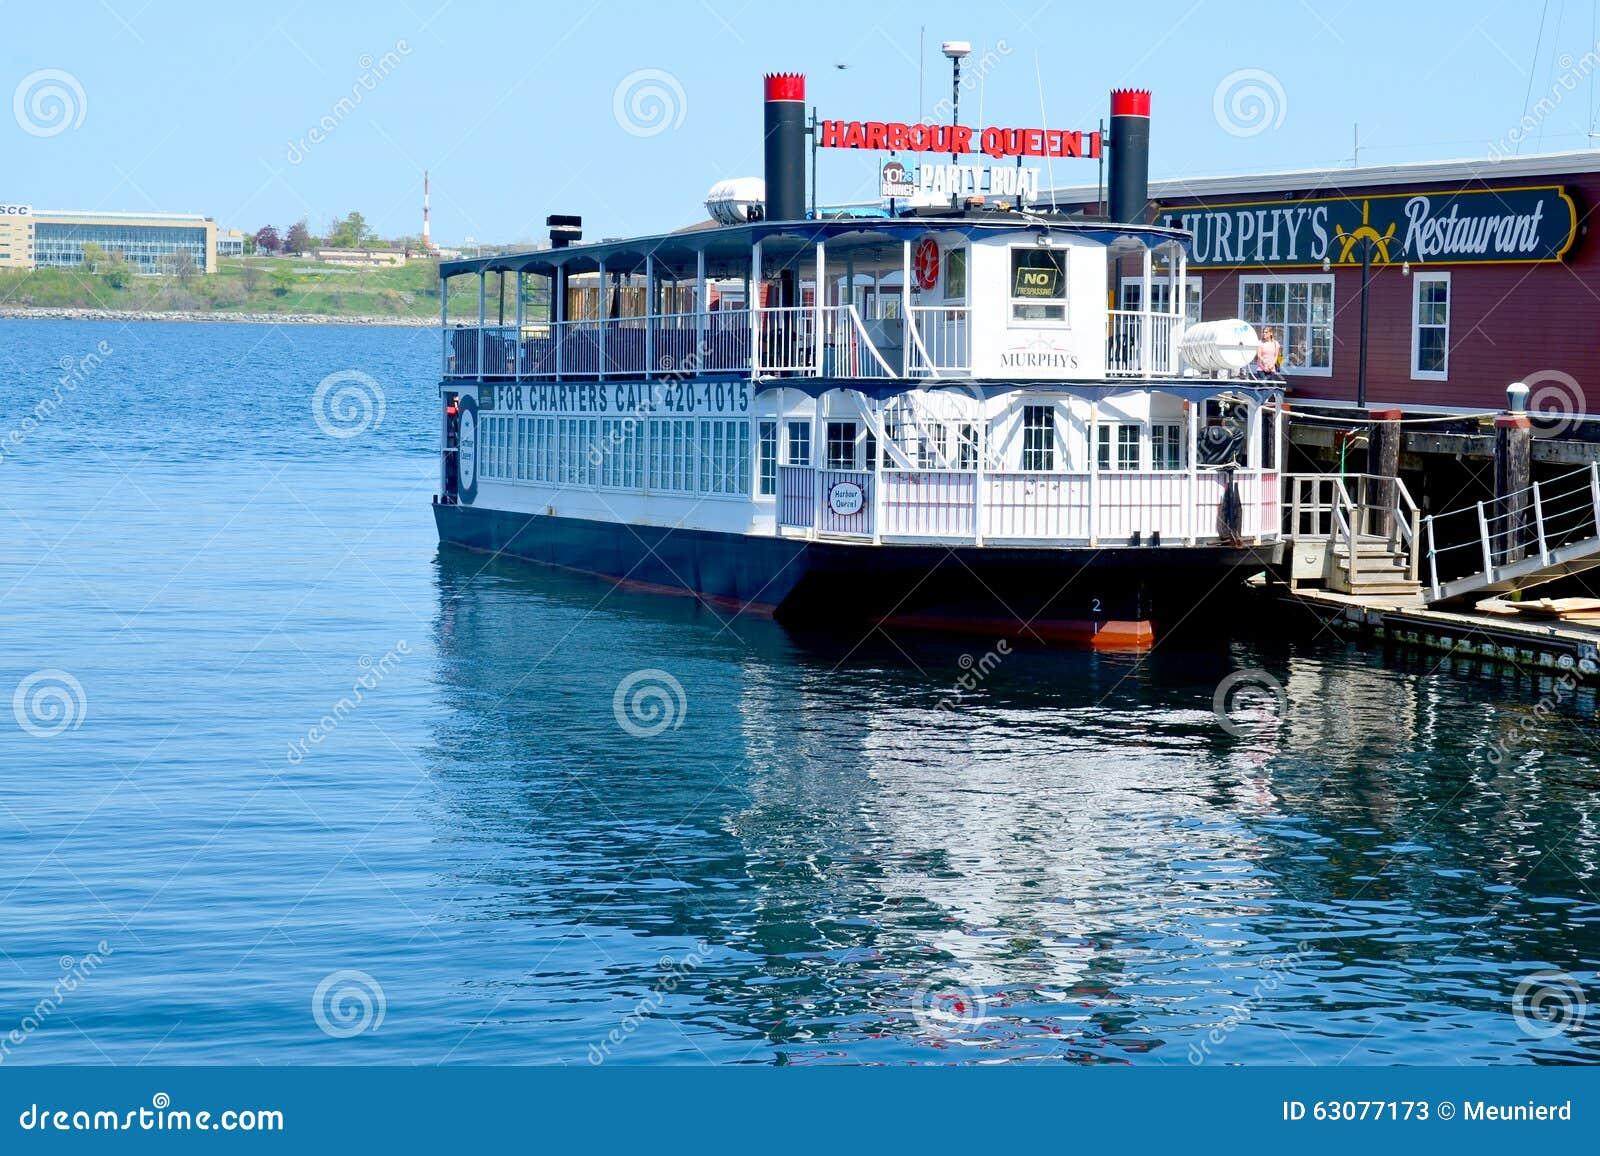 Harbour Queen I Editorial Stock Photo Image 63077173